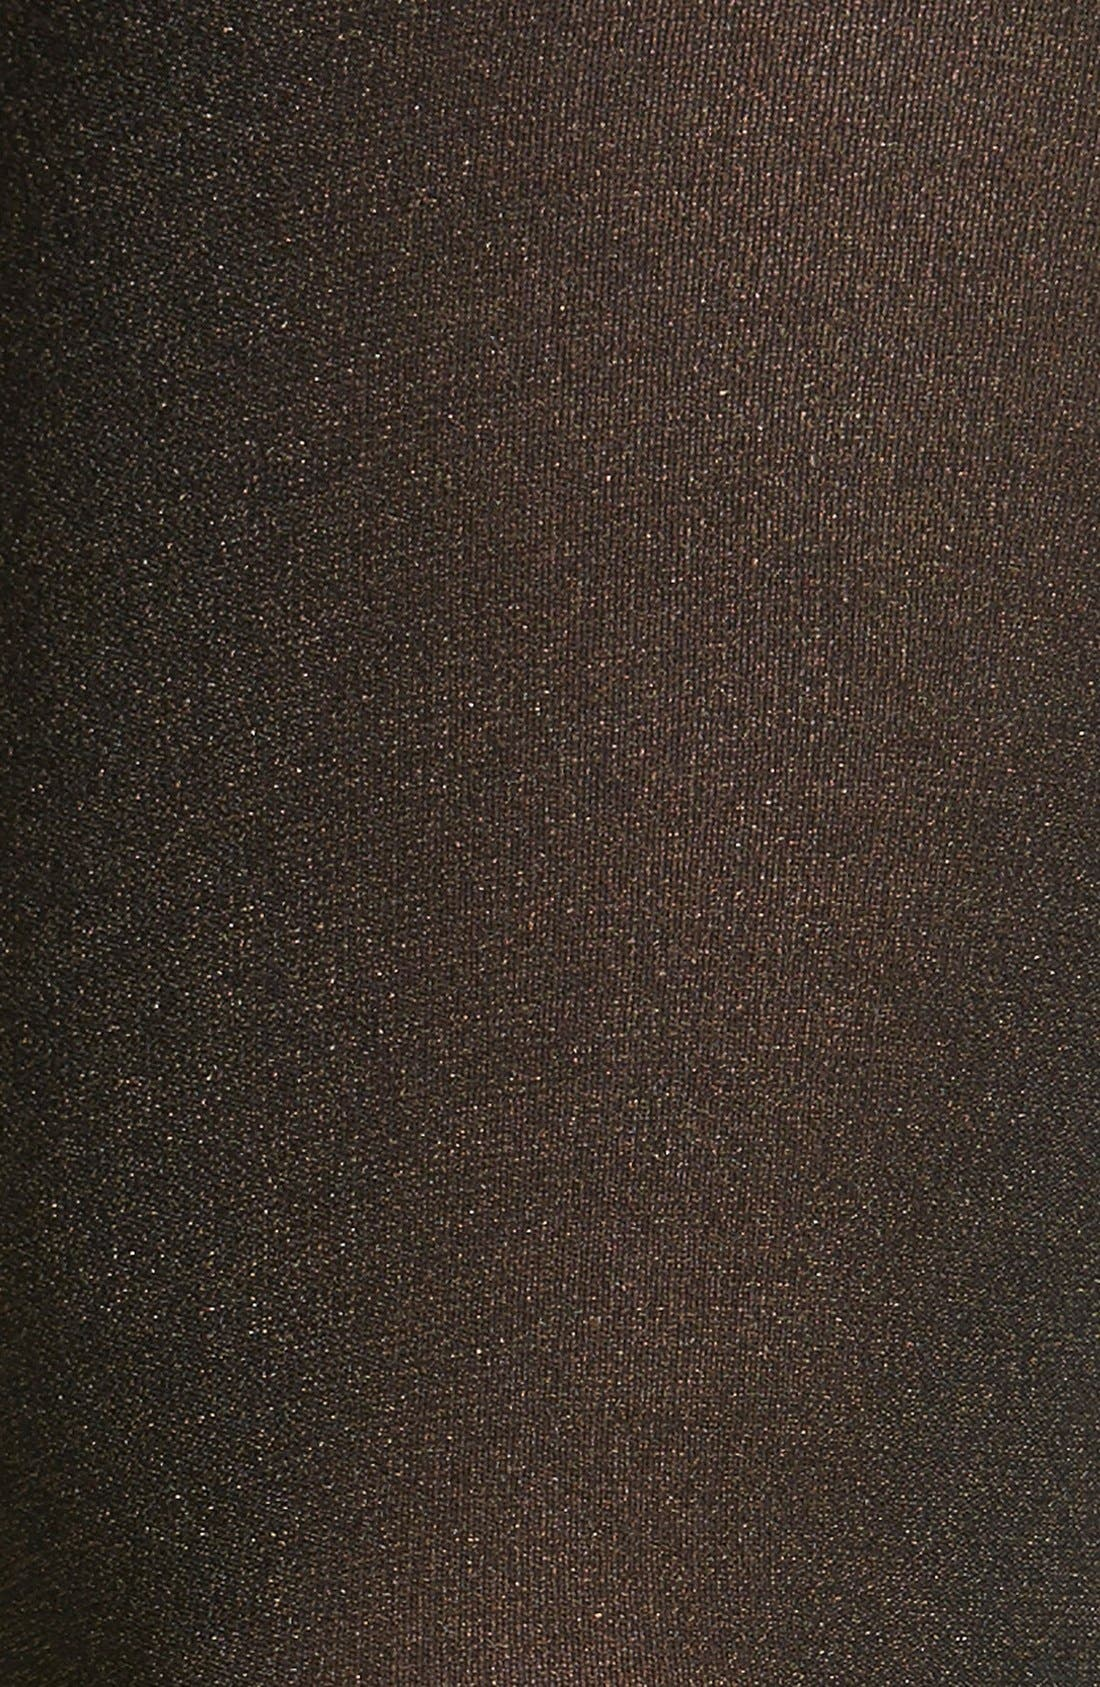 Alternate Image 2  - Donna Karan 'Blackened Shimmer' Tights